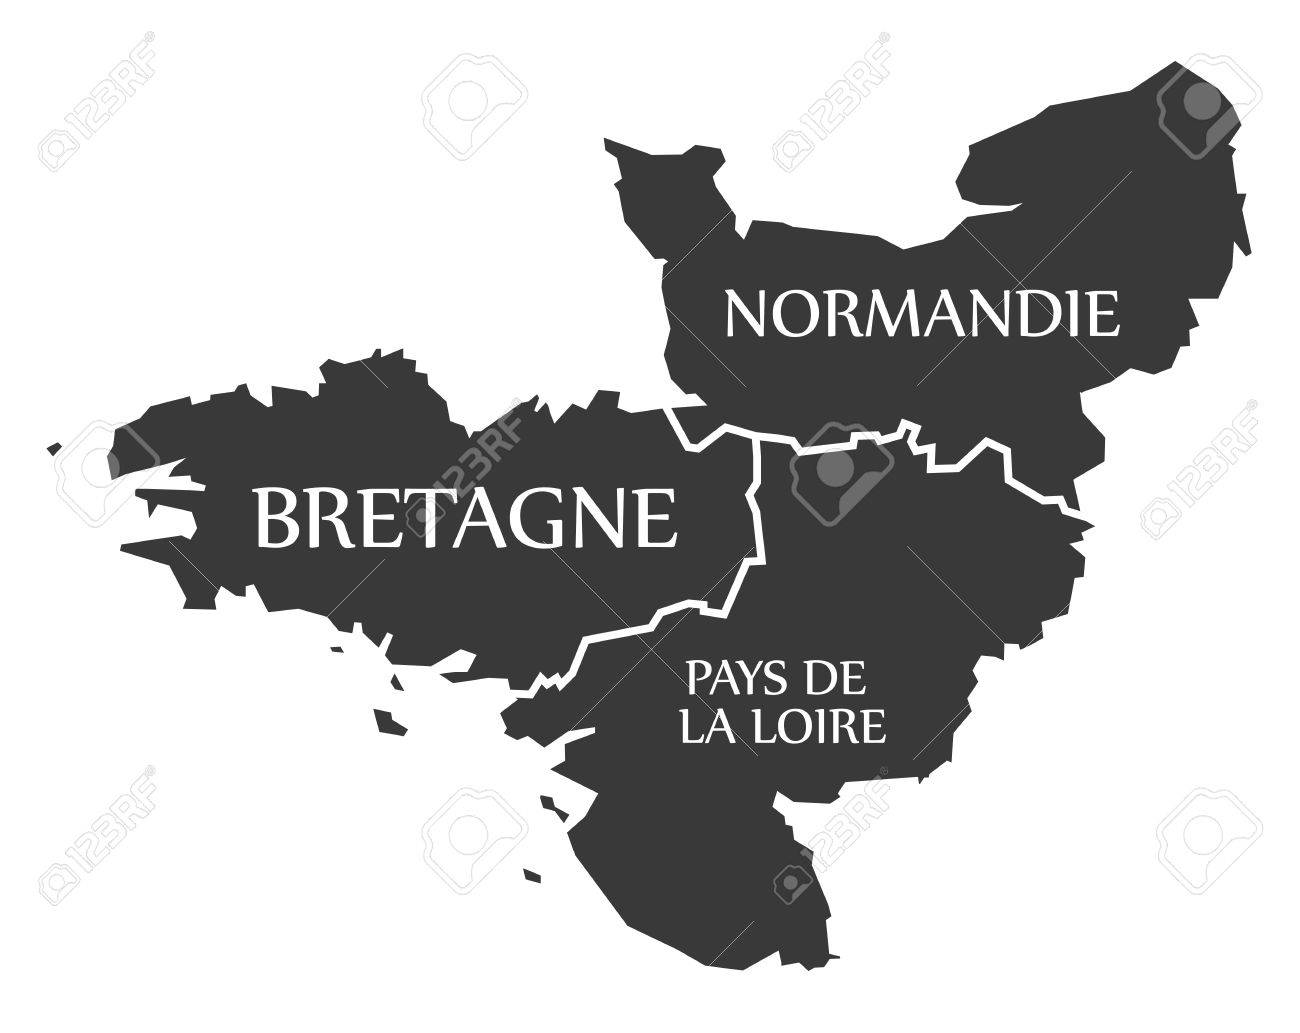 Mapa Bretaña Y Normandia.Bretana Normandia Paises Del Loira Mapa Francia Ilustracion